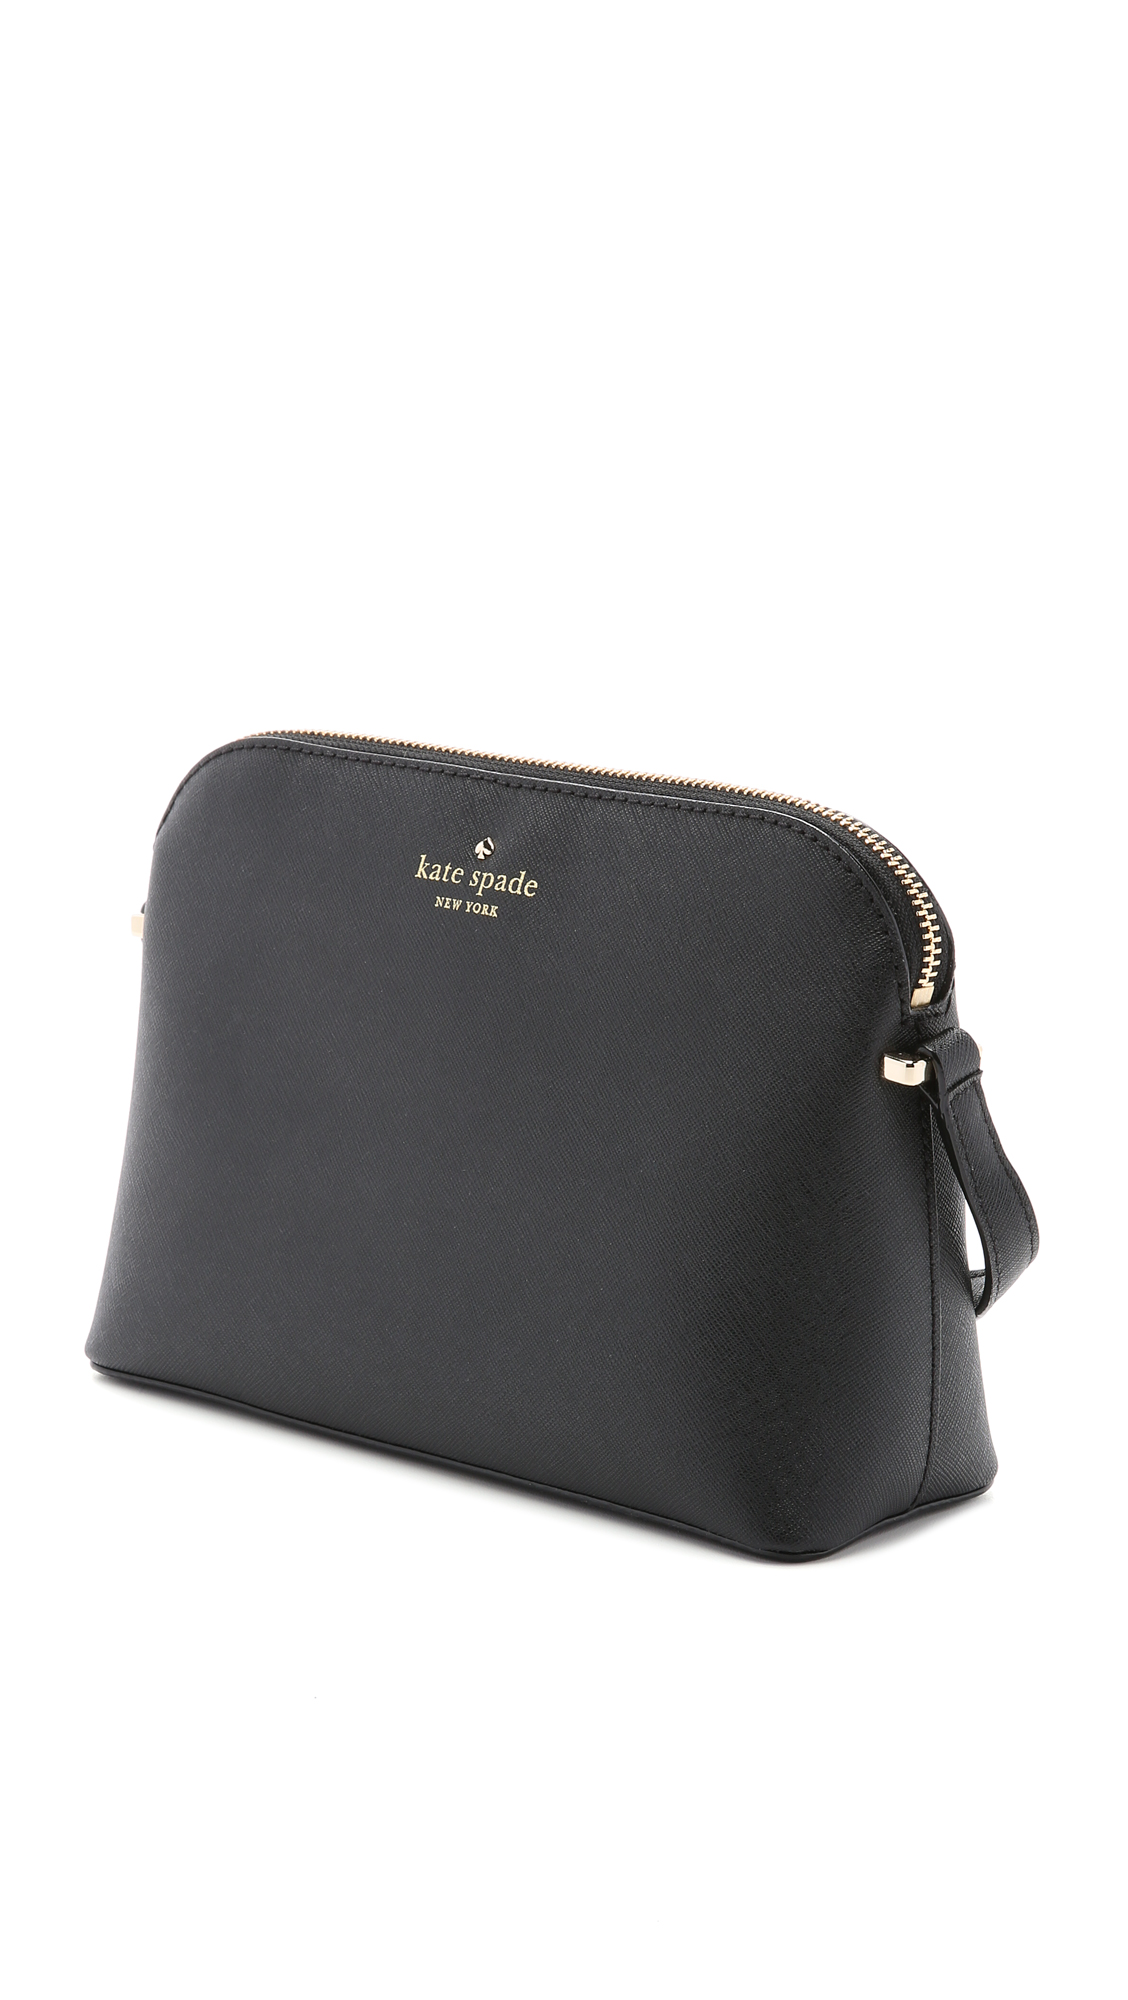 b50ceaf47457 Kate Spade New York Mandy Dome Cross Body Bag